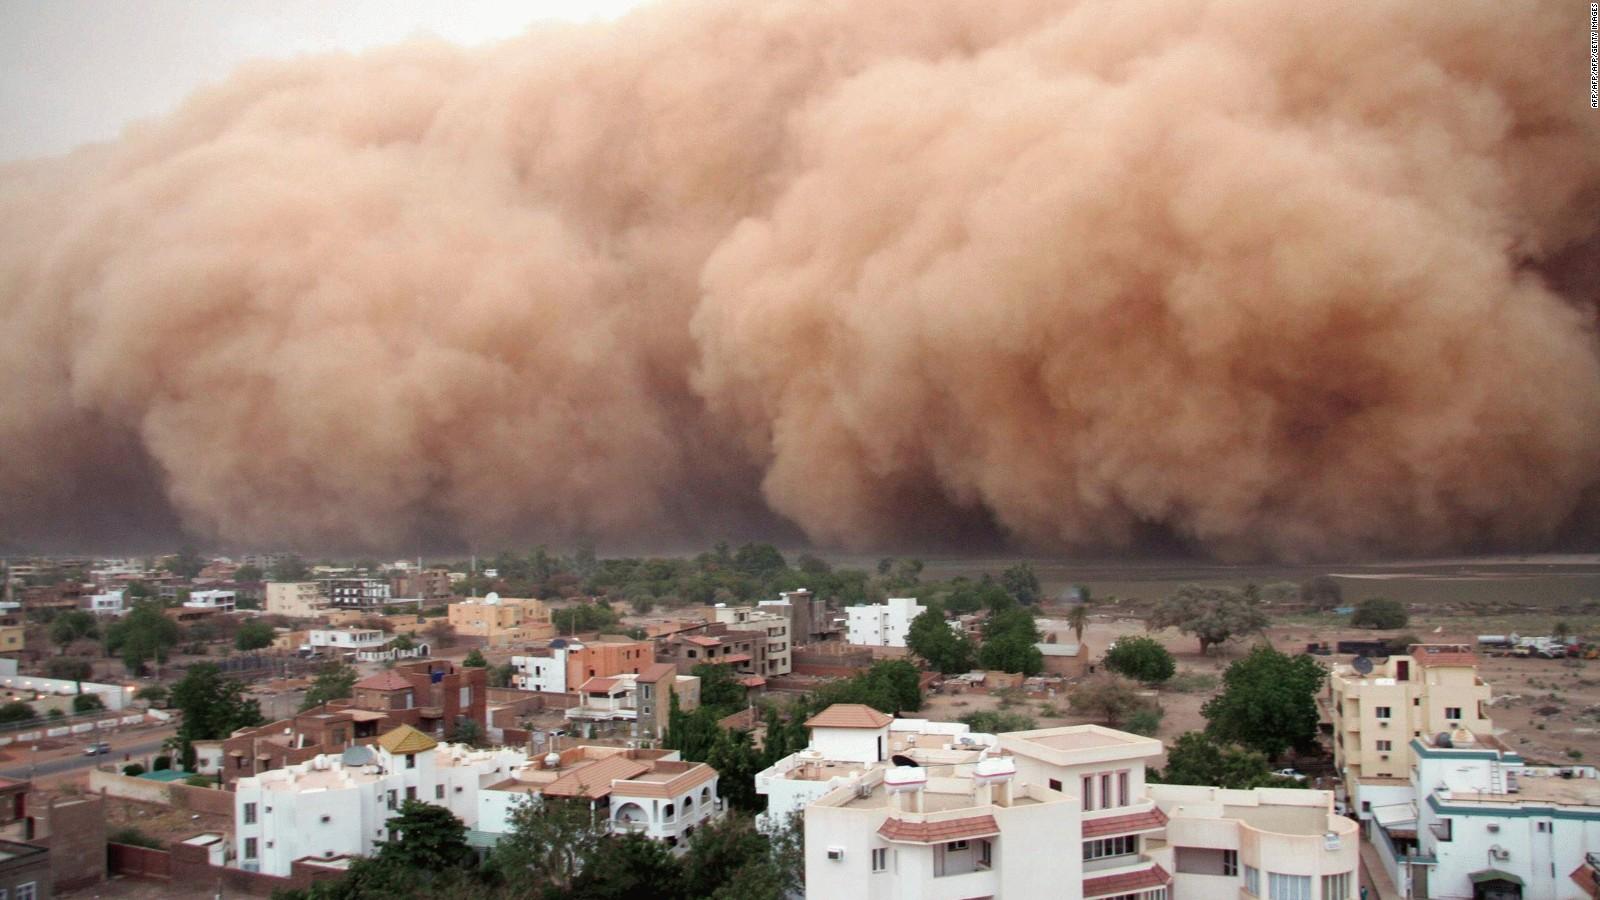 Massive sand storm hits Sudan   CNN Video 1600x900